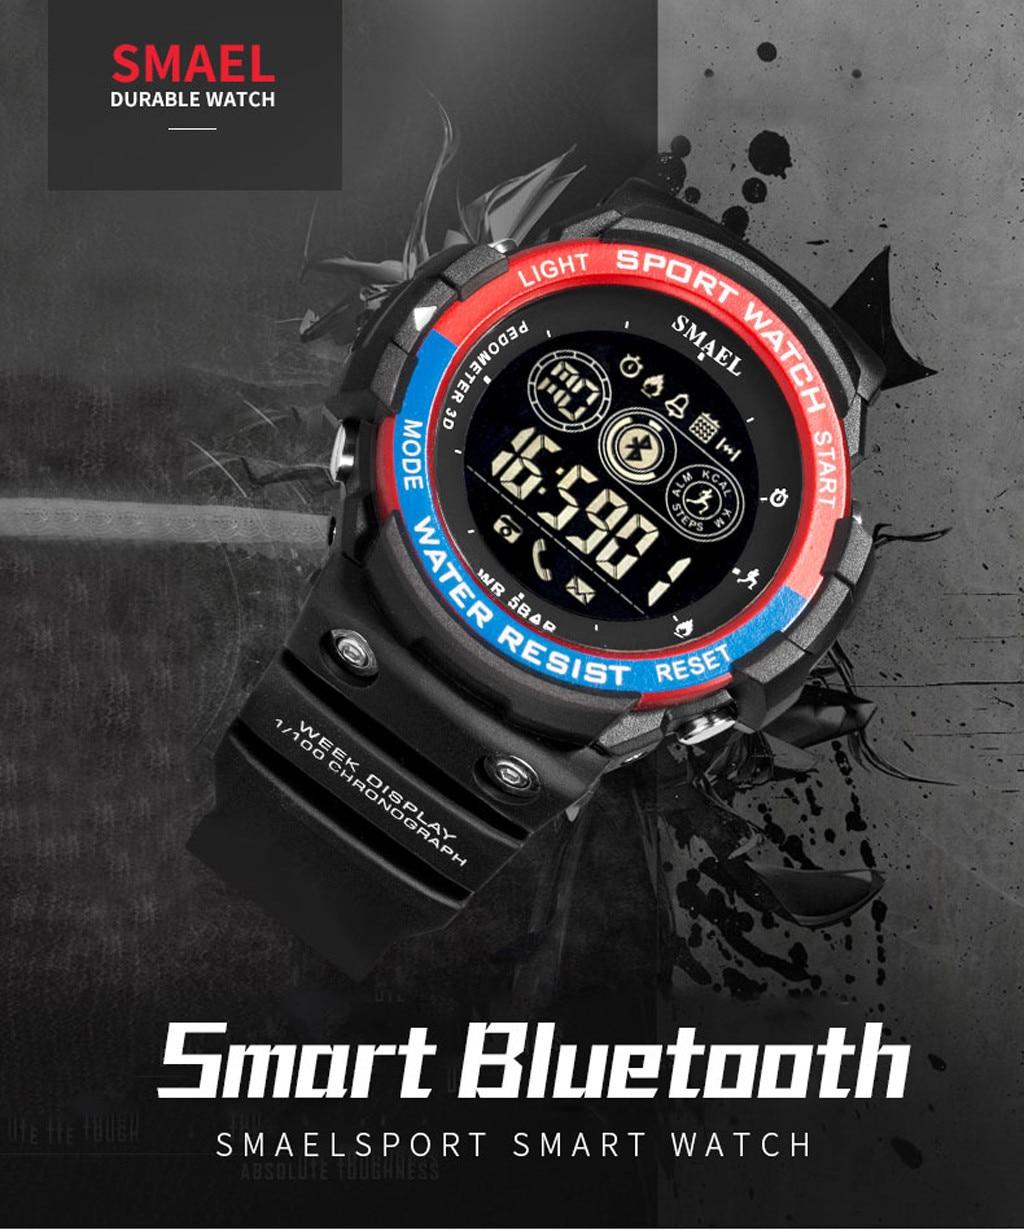 Digital Watch Bluetooth Wrist Military Running Electronic Men's Men Fashion Sport Led-Display